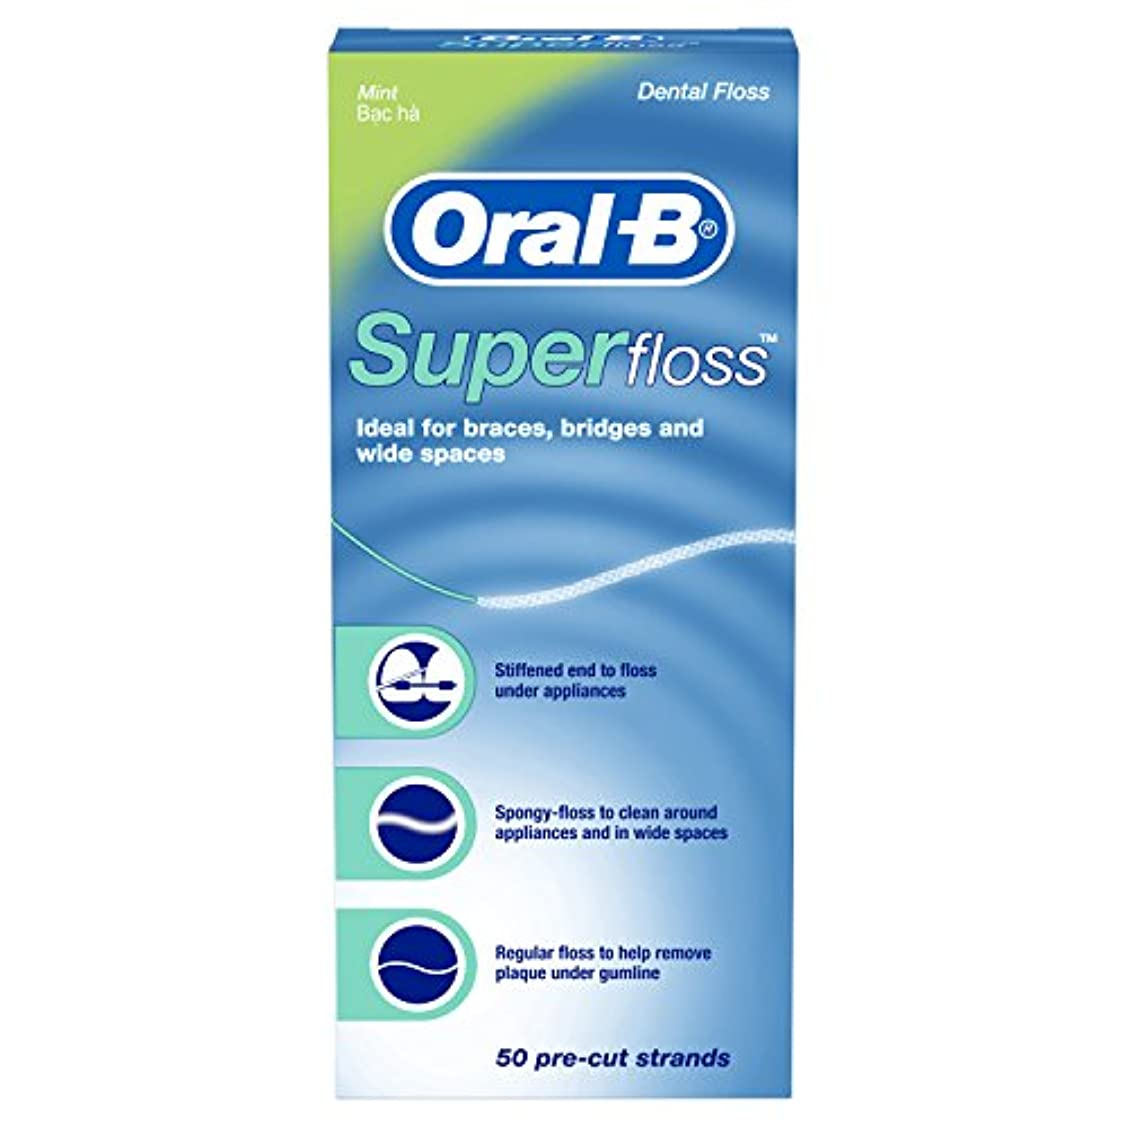 Oral-B Super Floss Dental Floss Mint Strips 50-Count (並行輸入品)